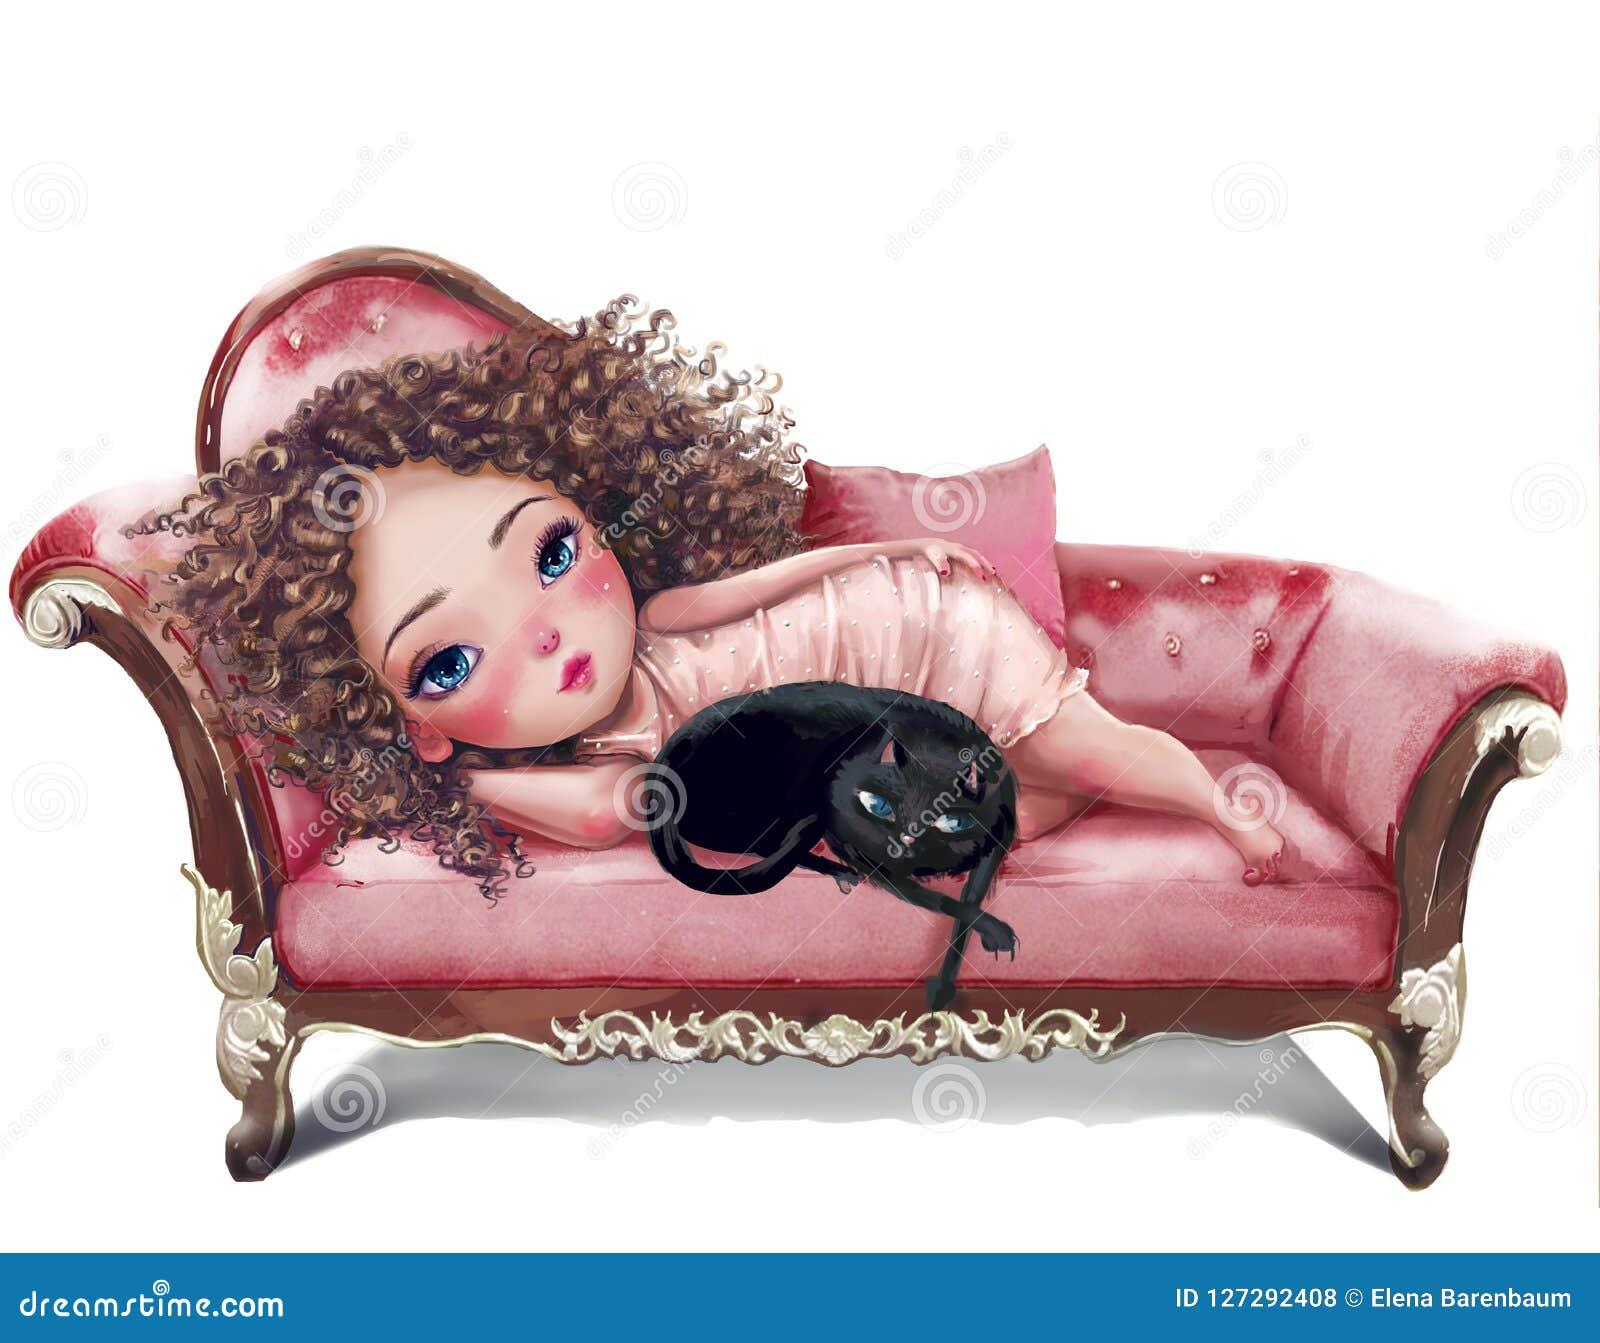 Cartoon girl with cat on sofa